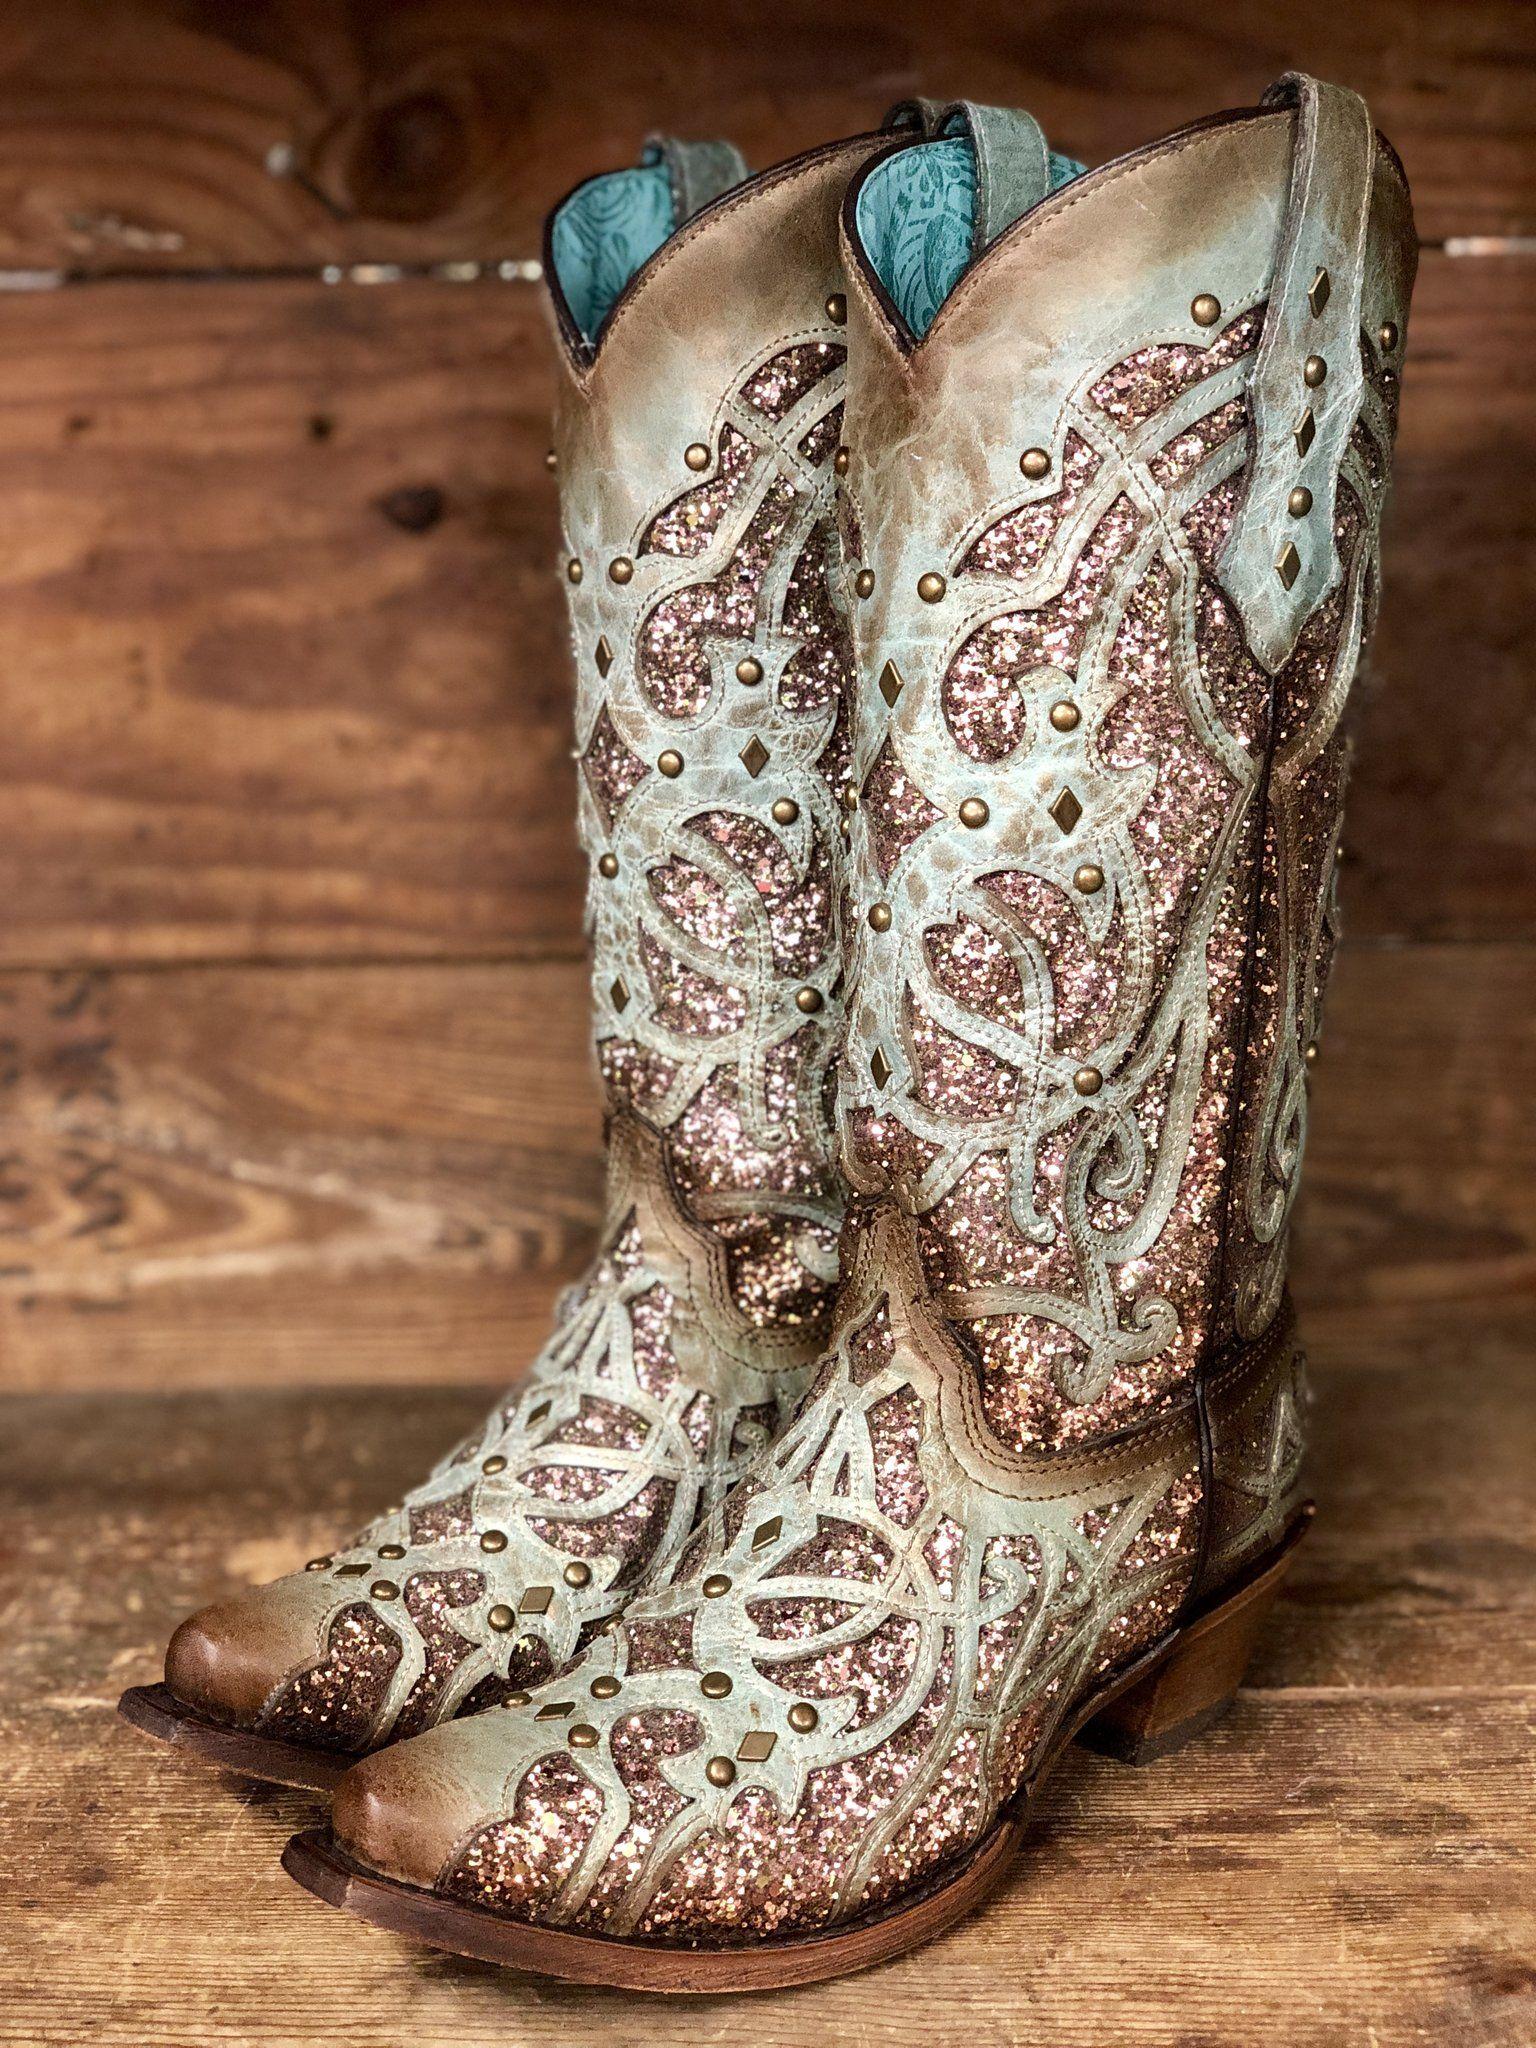 495f88d0cdad Corral Women's Mint & Chocolate Glitter Inlay Snip Toe Western Boots C3332